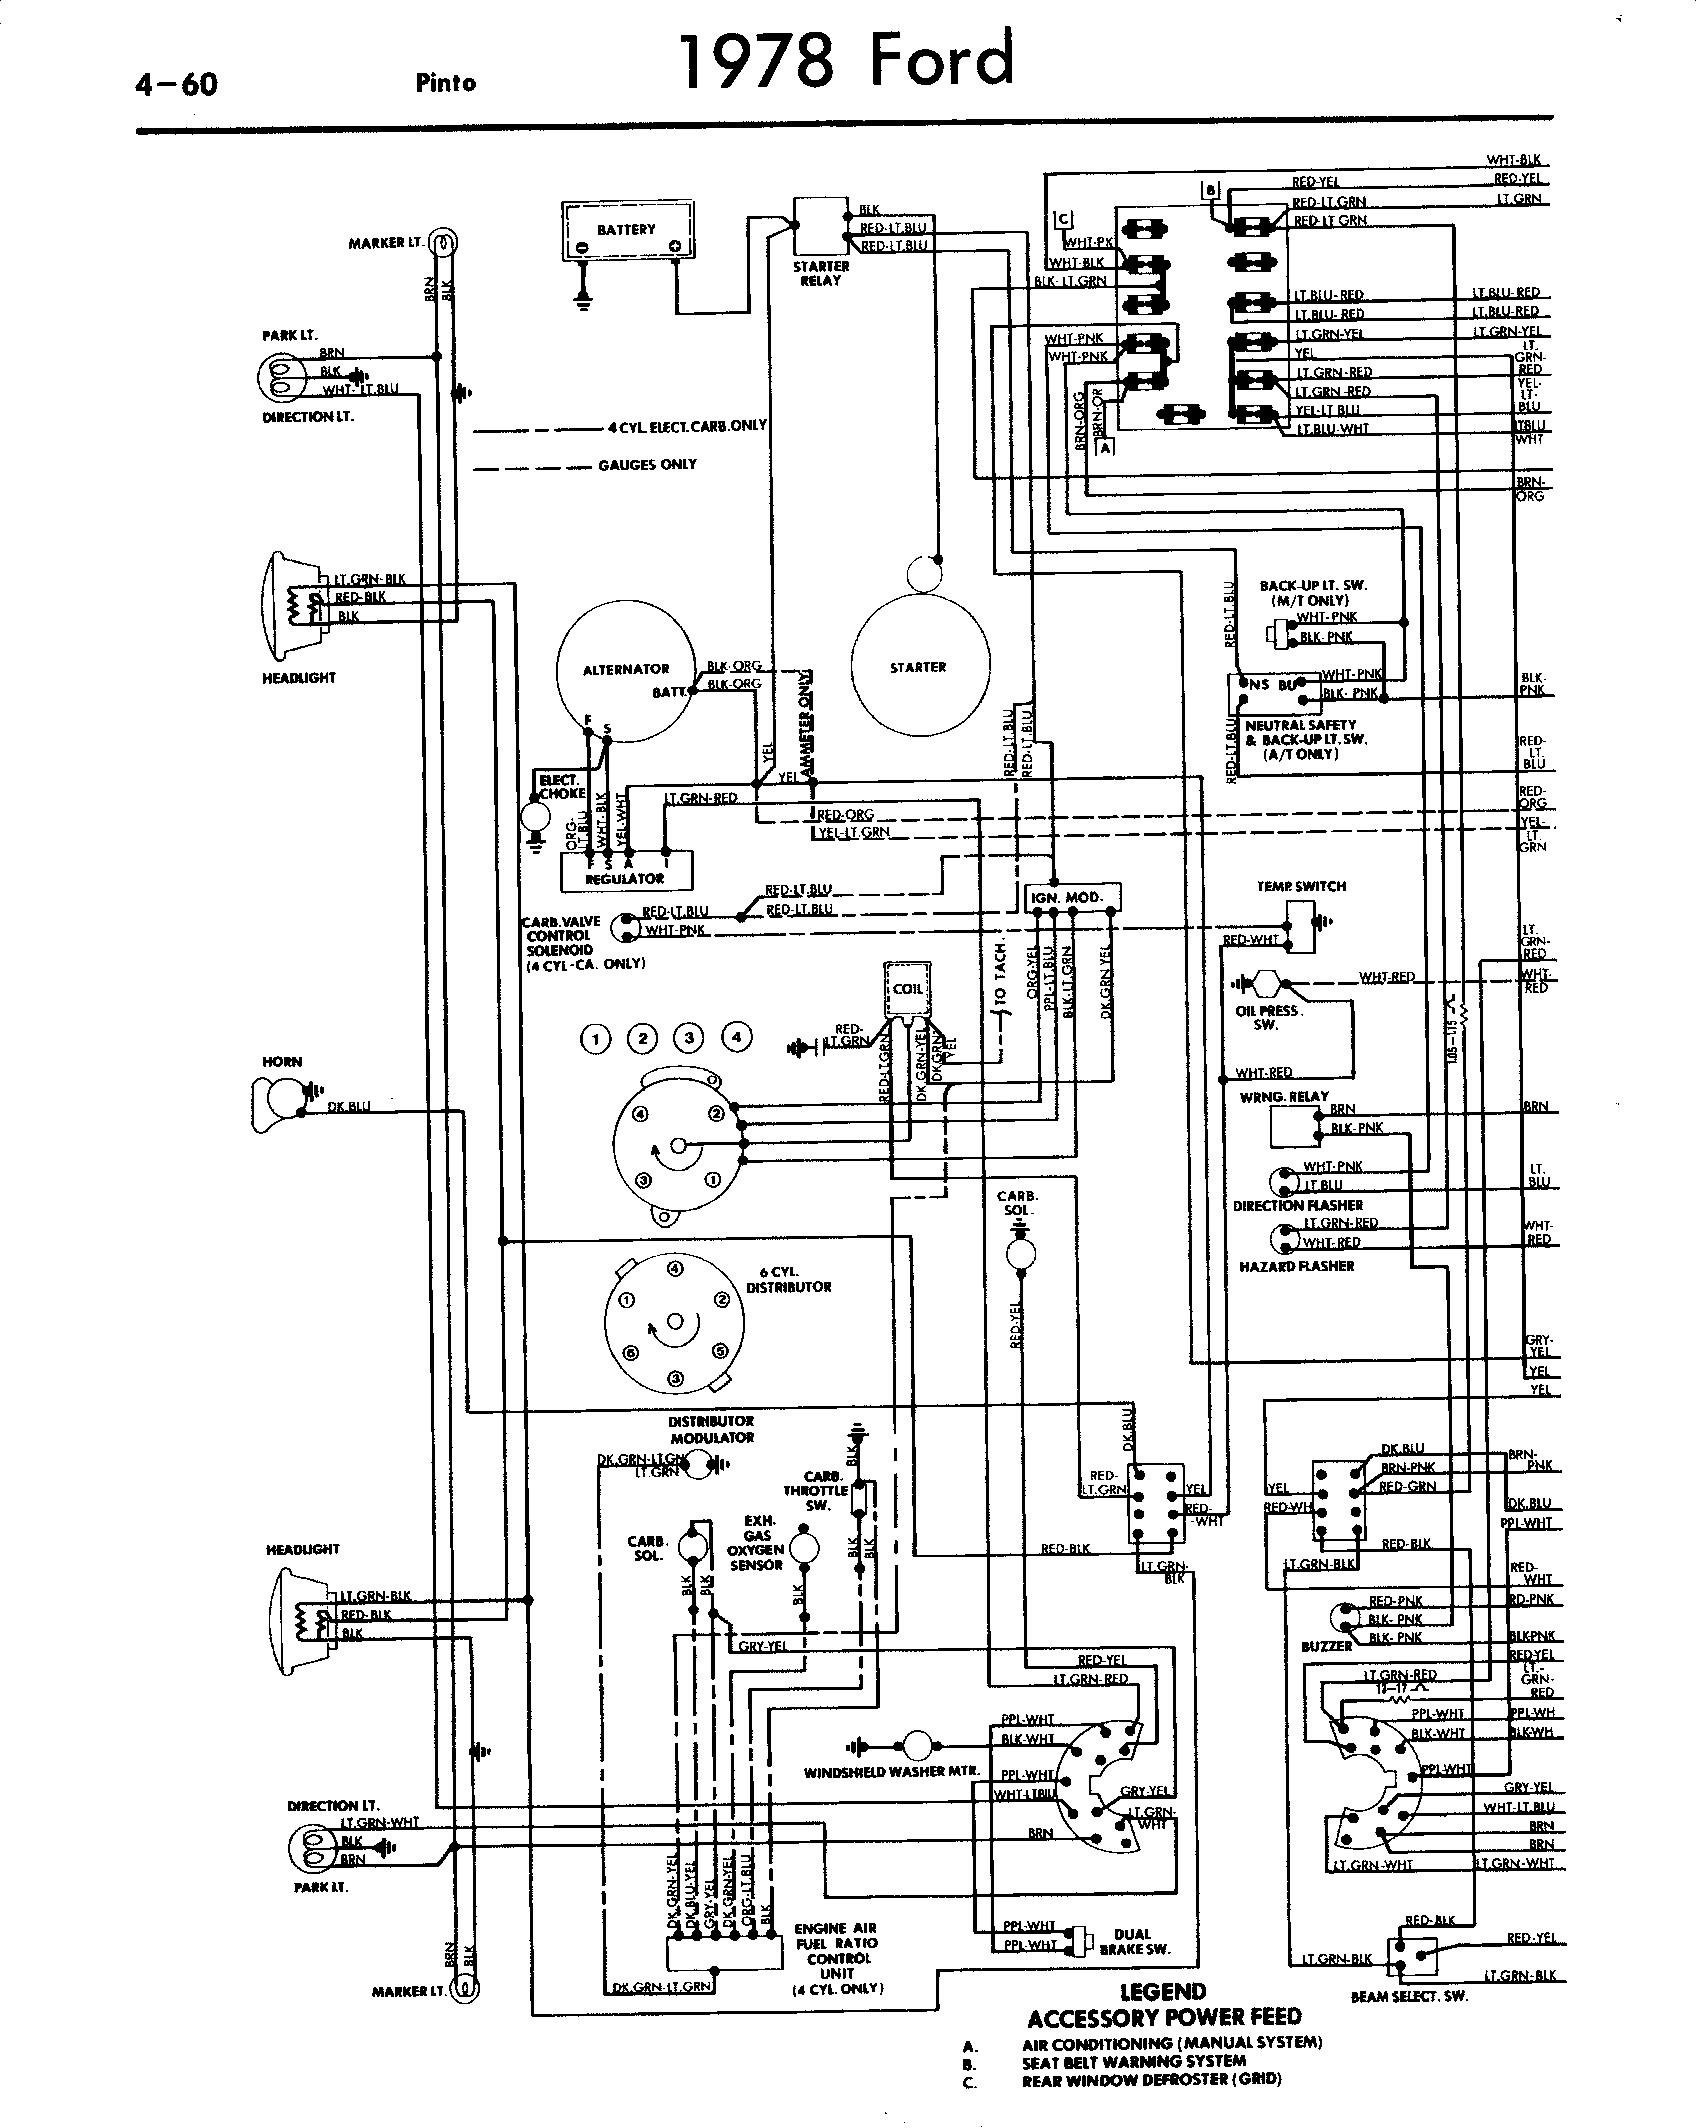 Diagram] 1982 Ford F 150 5 0 Wiring Diagram Full Version Hd